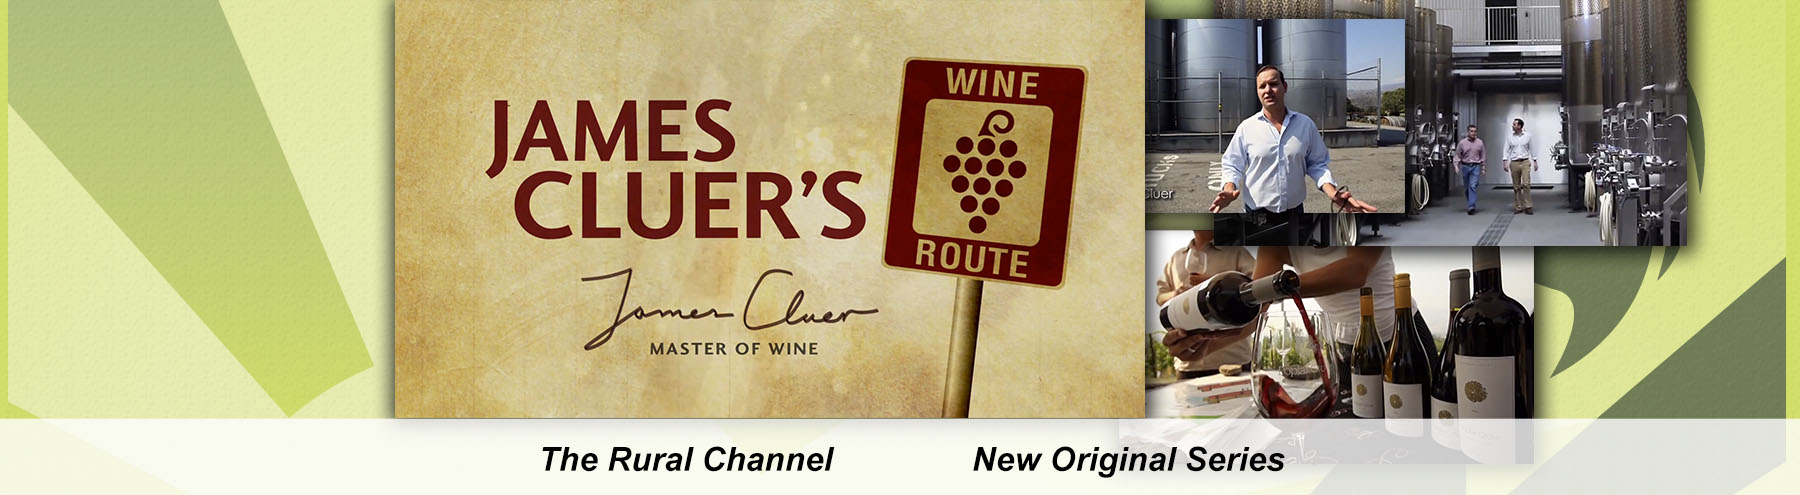 James Cluer banner